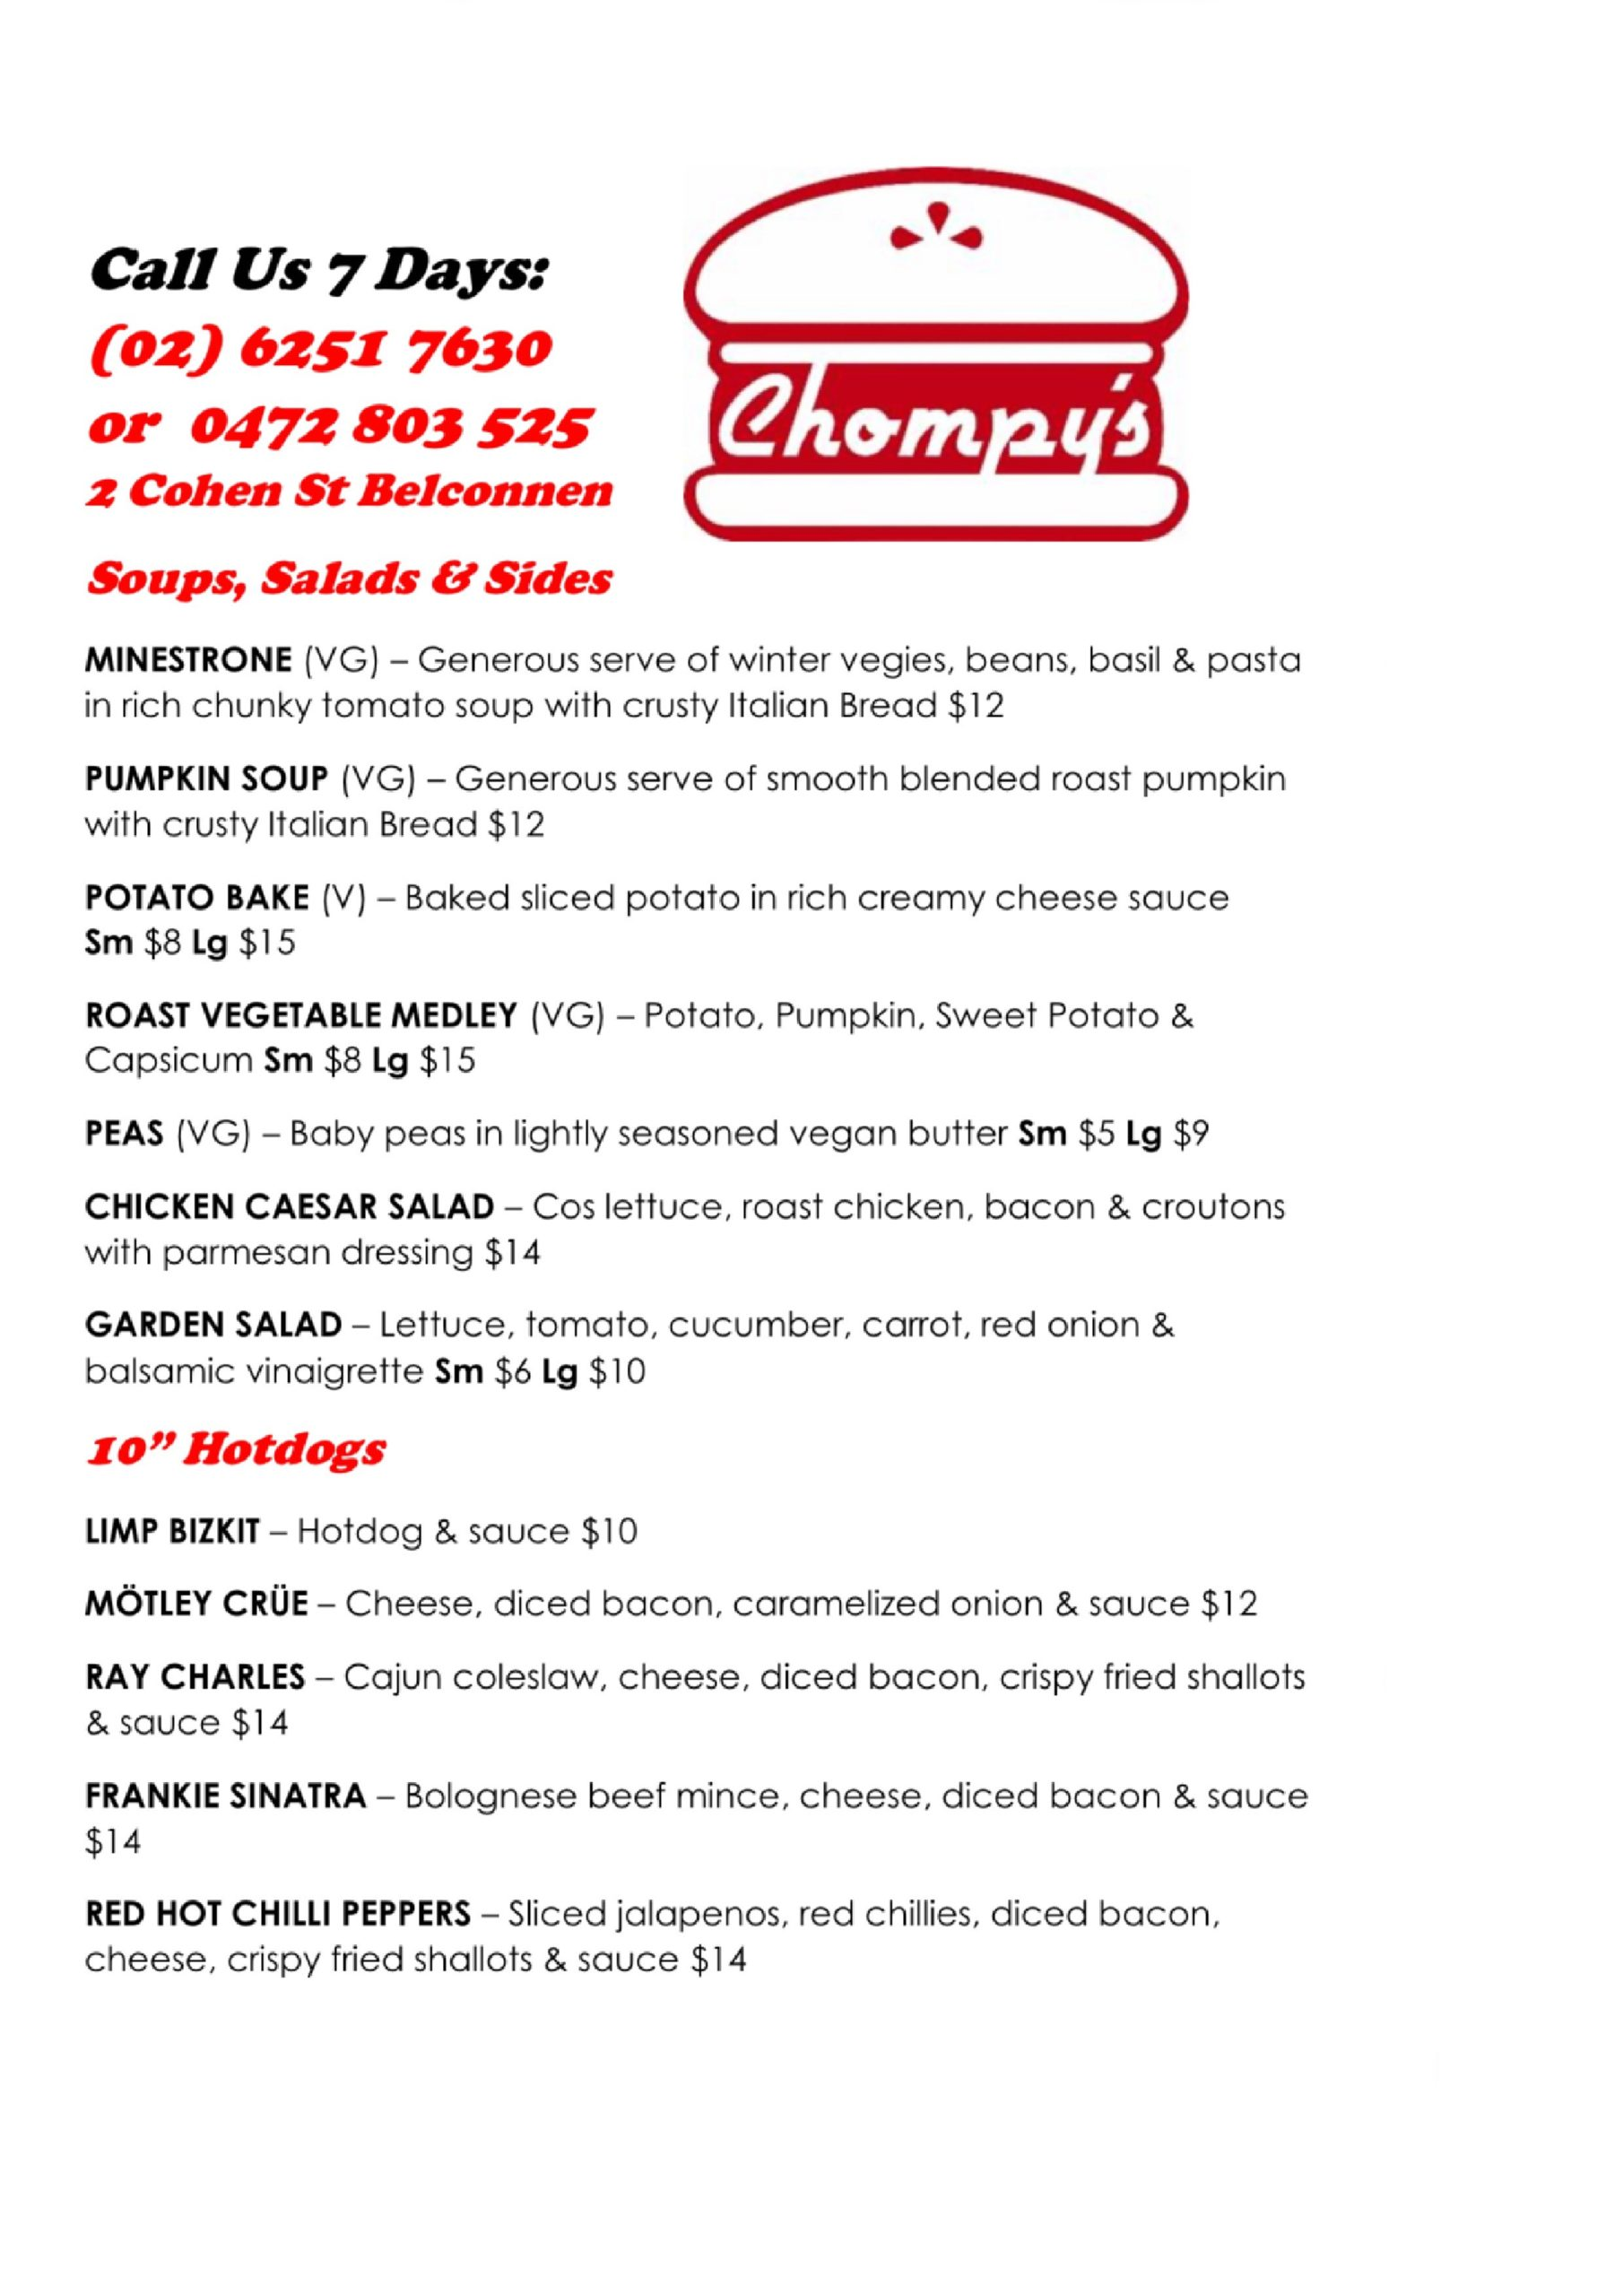 Chompy's Menu image 2